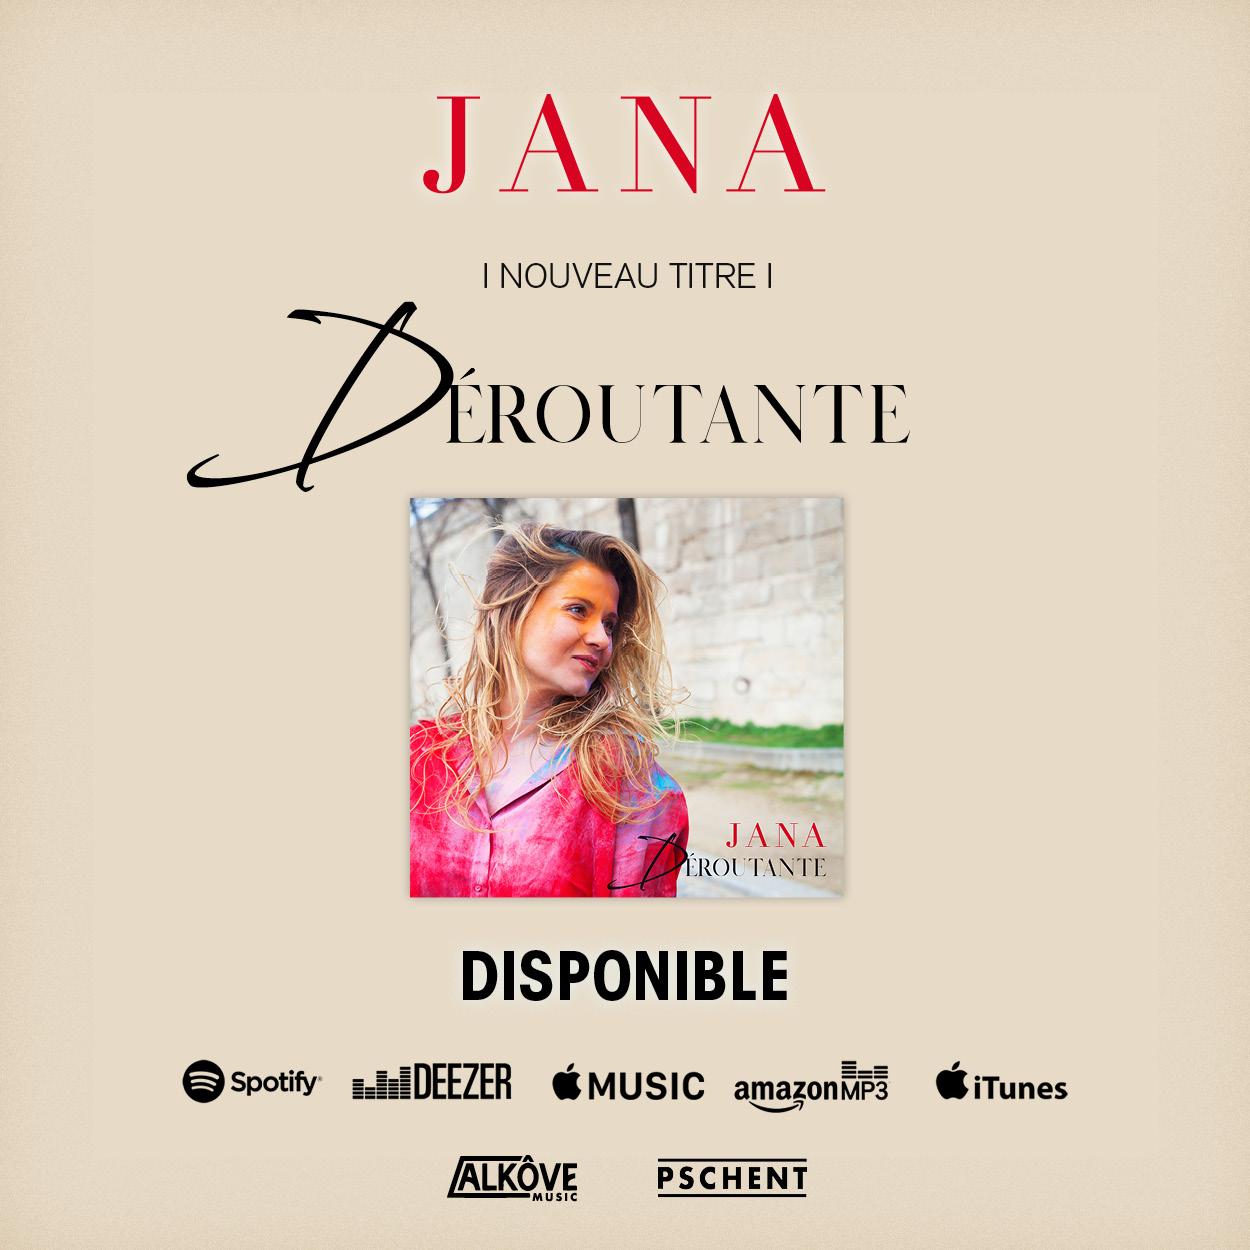 Insta_Deroutante_600x600